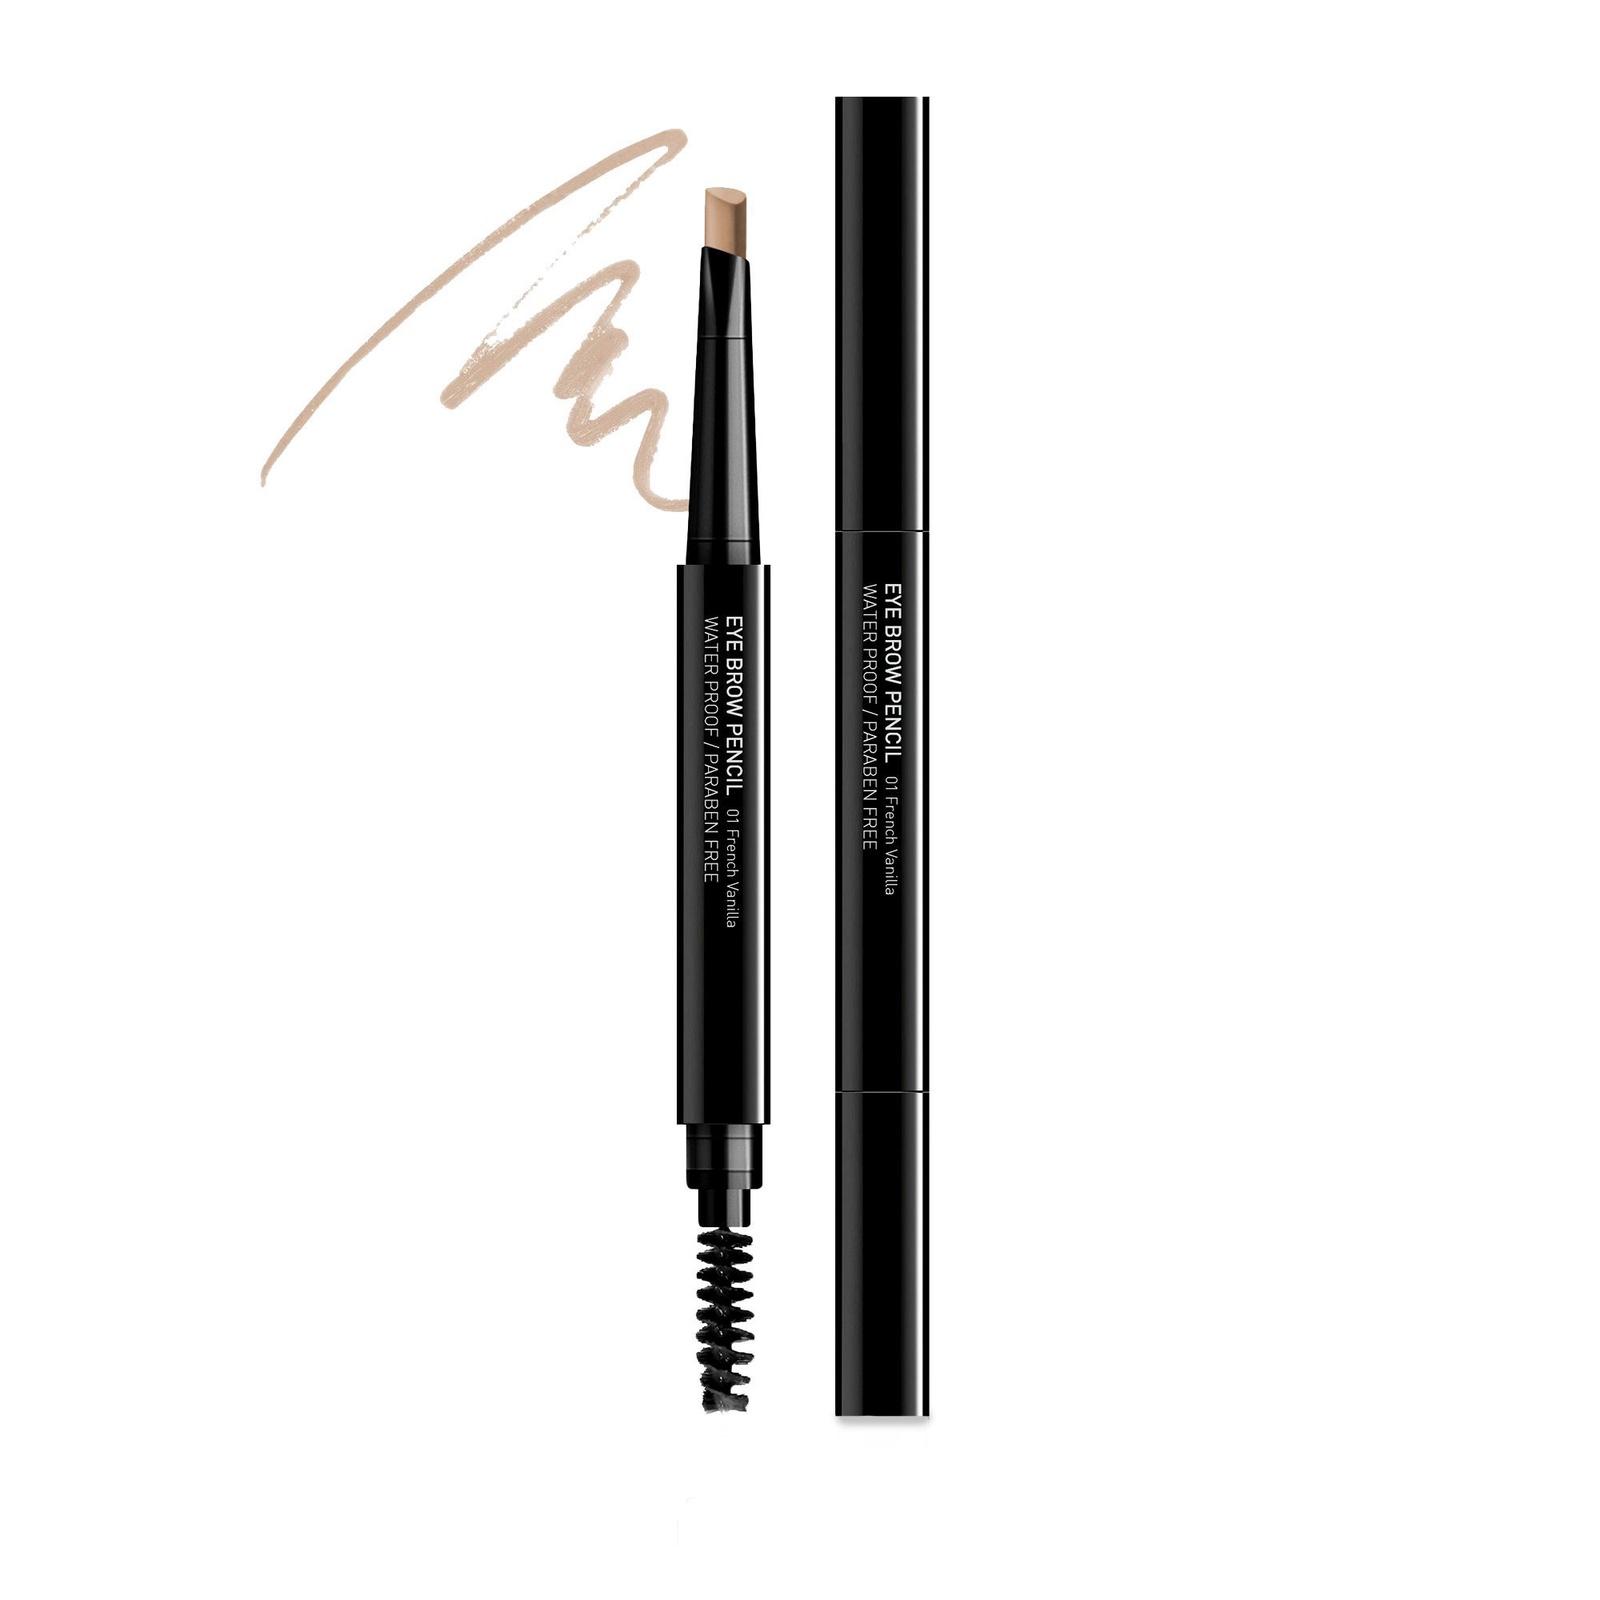 Карандаш для бровей CAILYN Eyebrow Pencil, 01 French Vanilla недорого